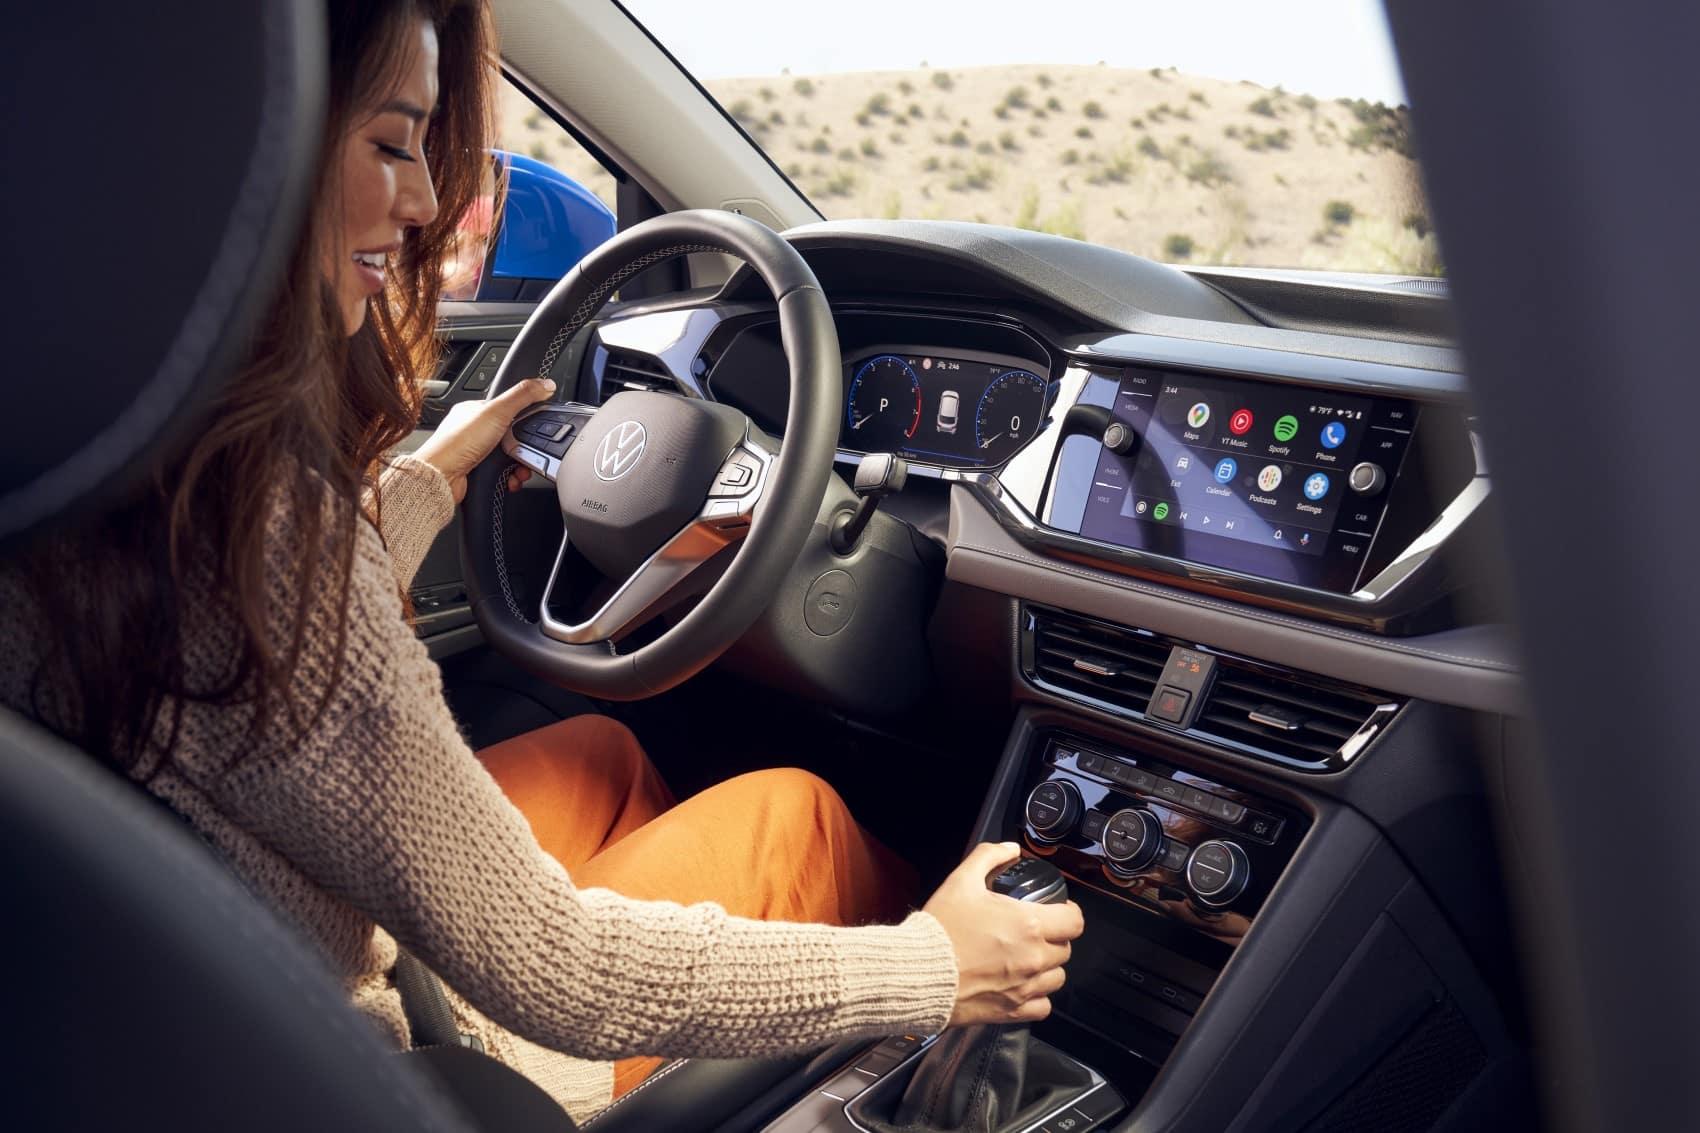 2022 Volkswagen Taos interior shot women in driver's seat infotainment system